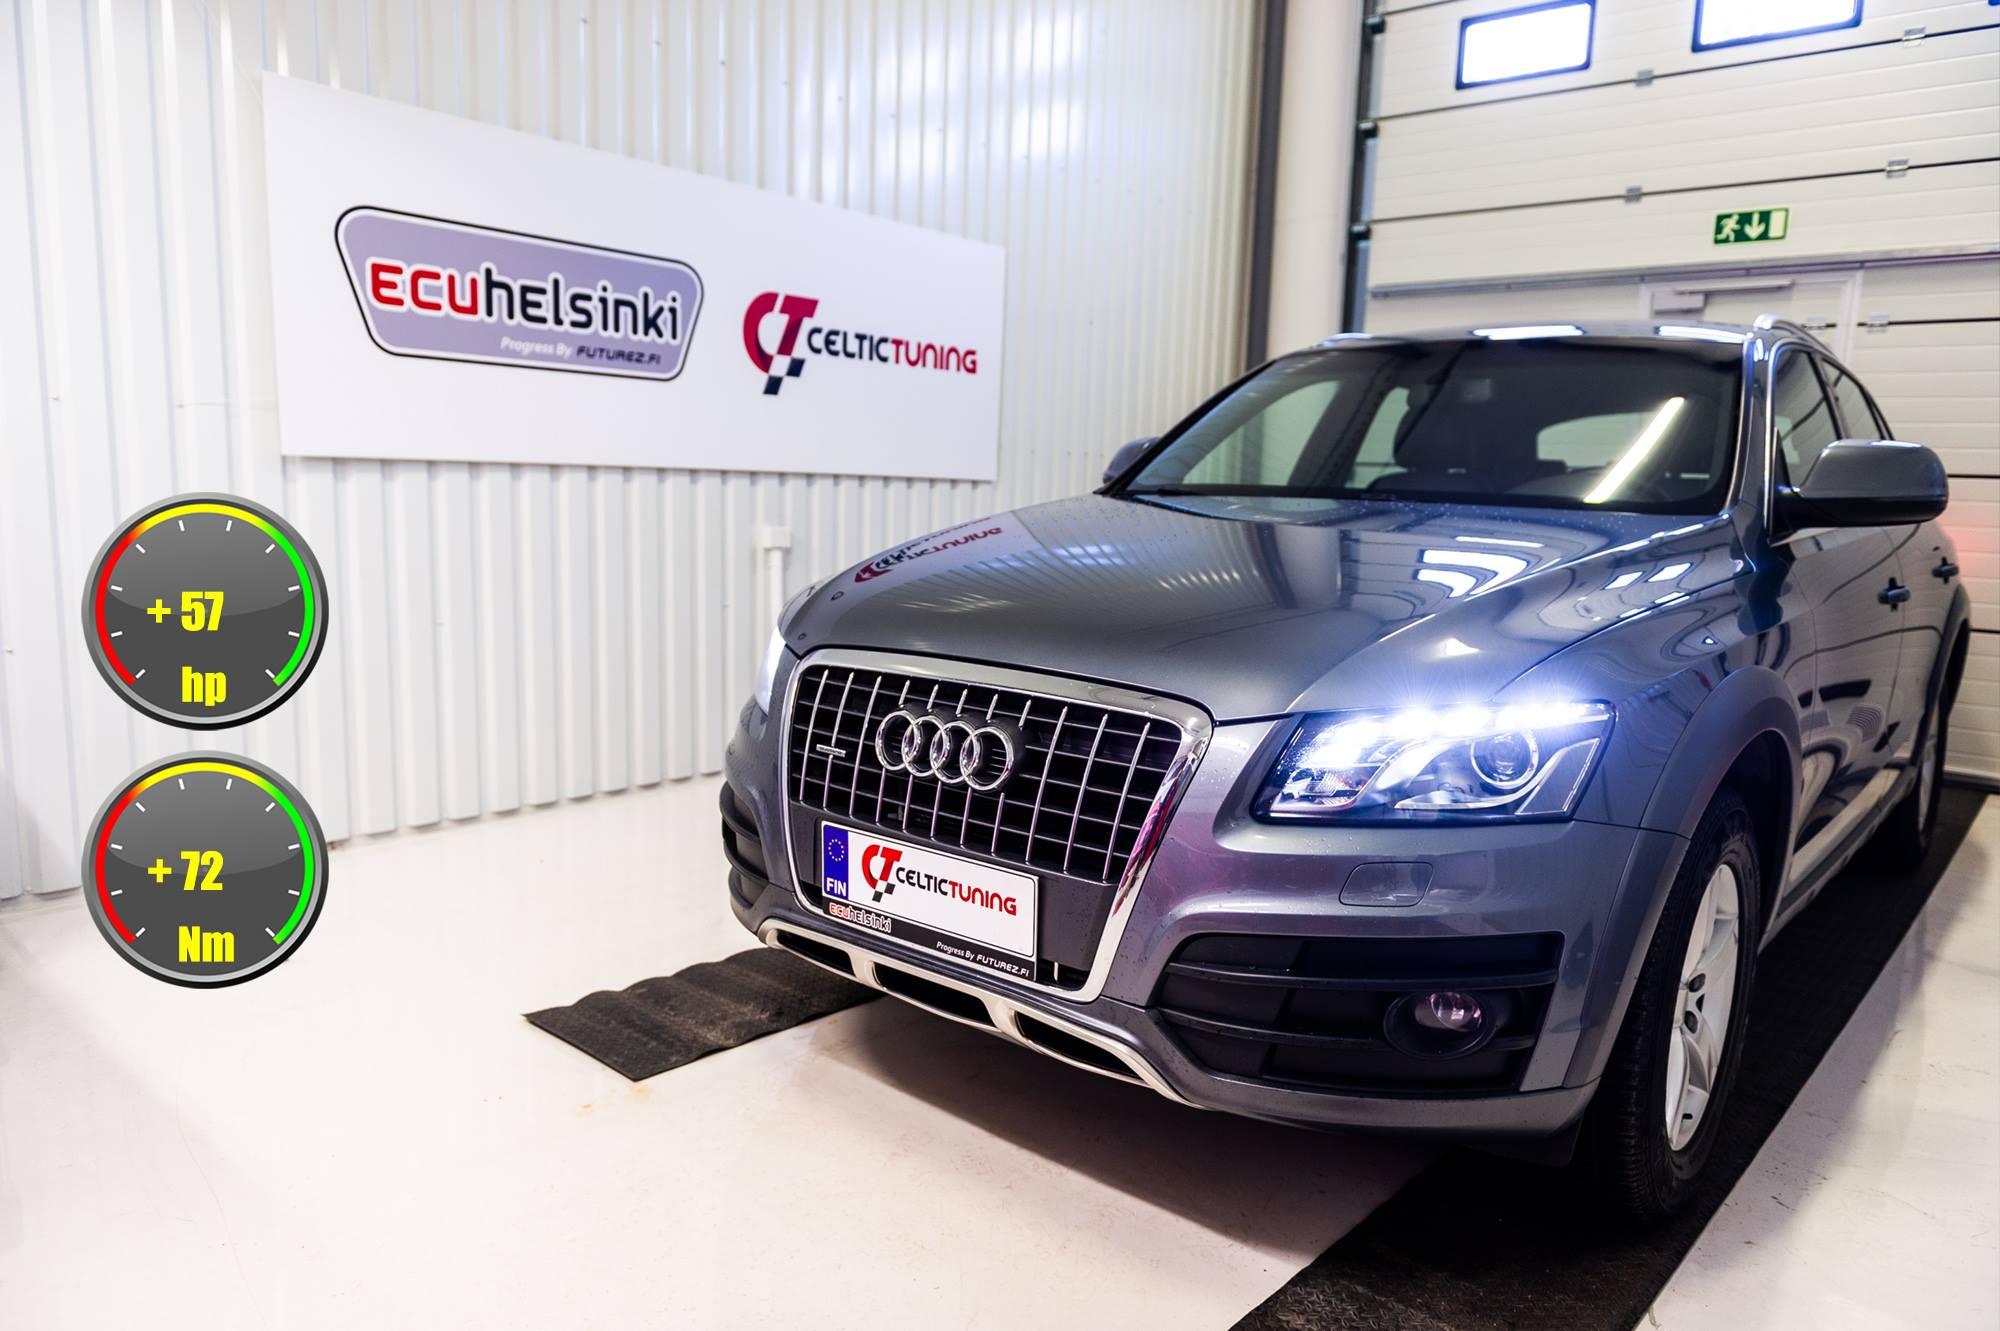 Audi Q5 2.0 TDI lastutus celtic tuni